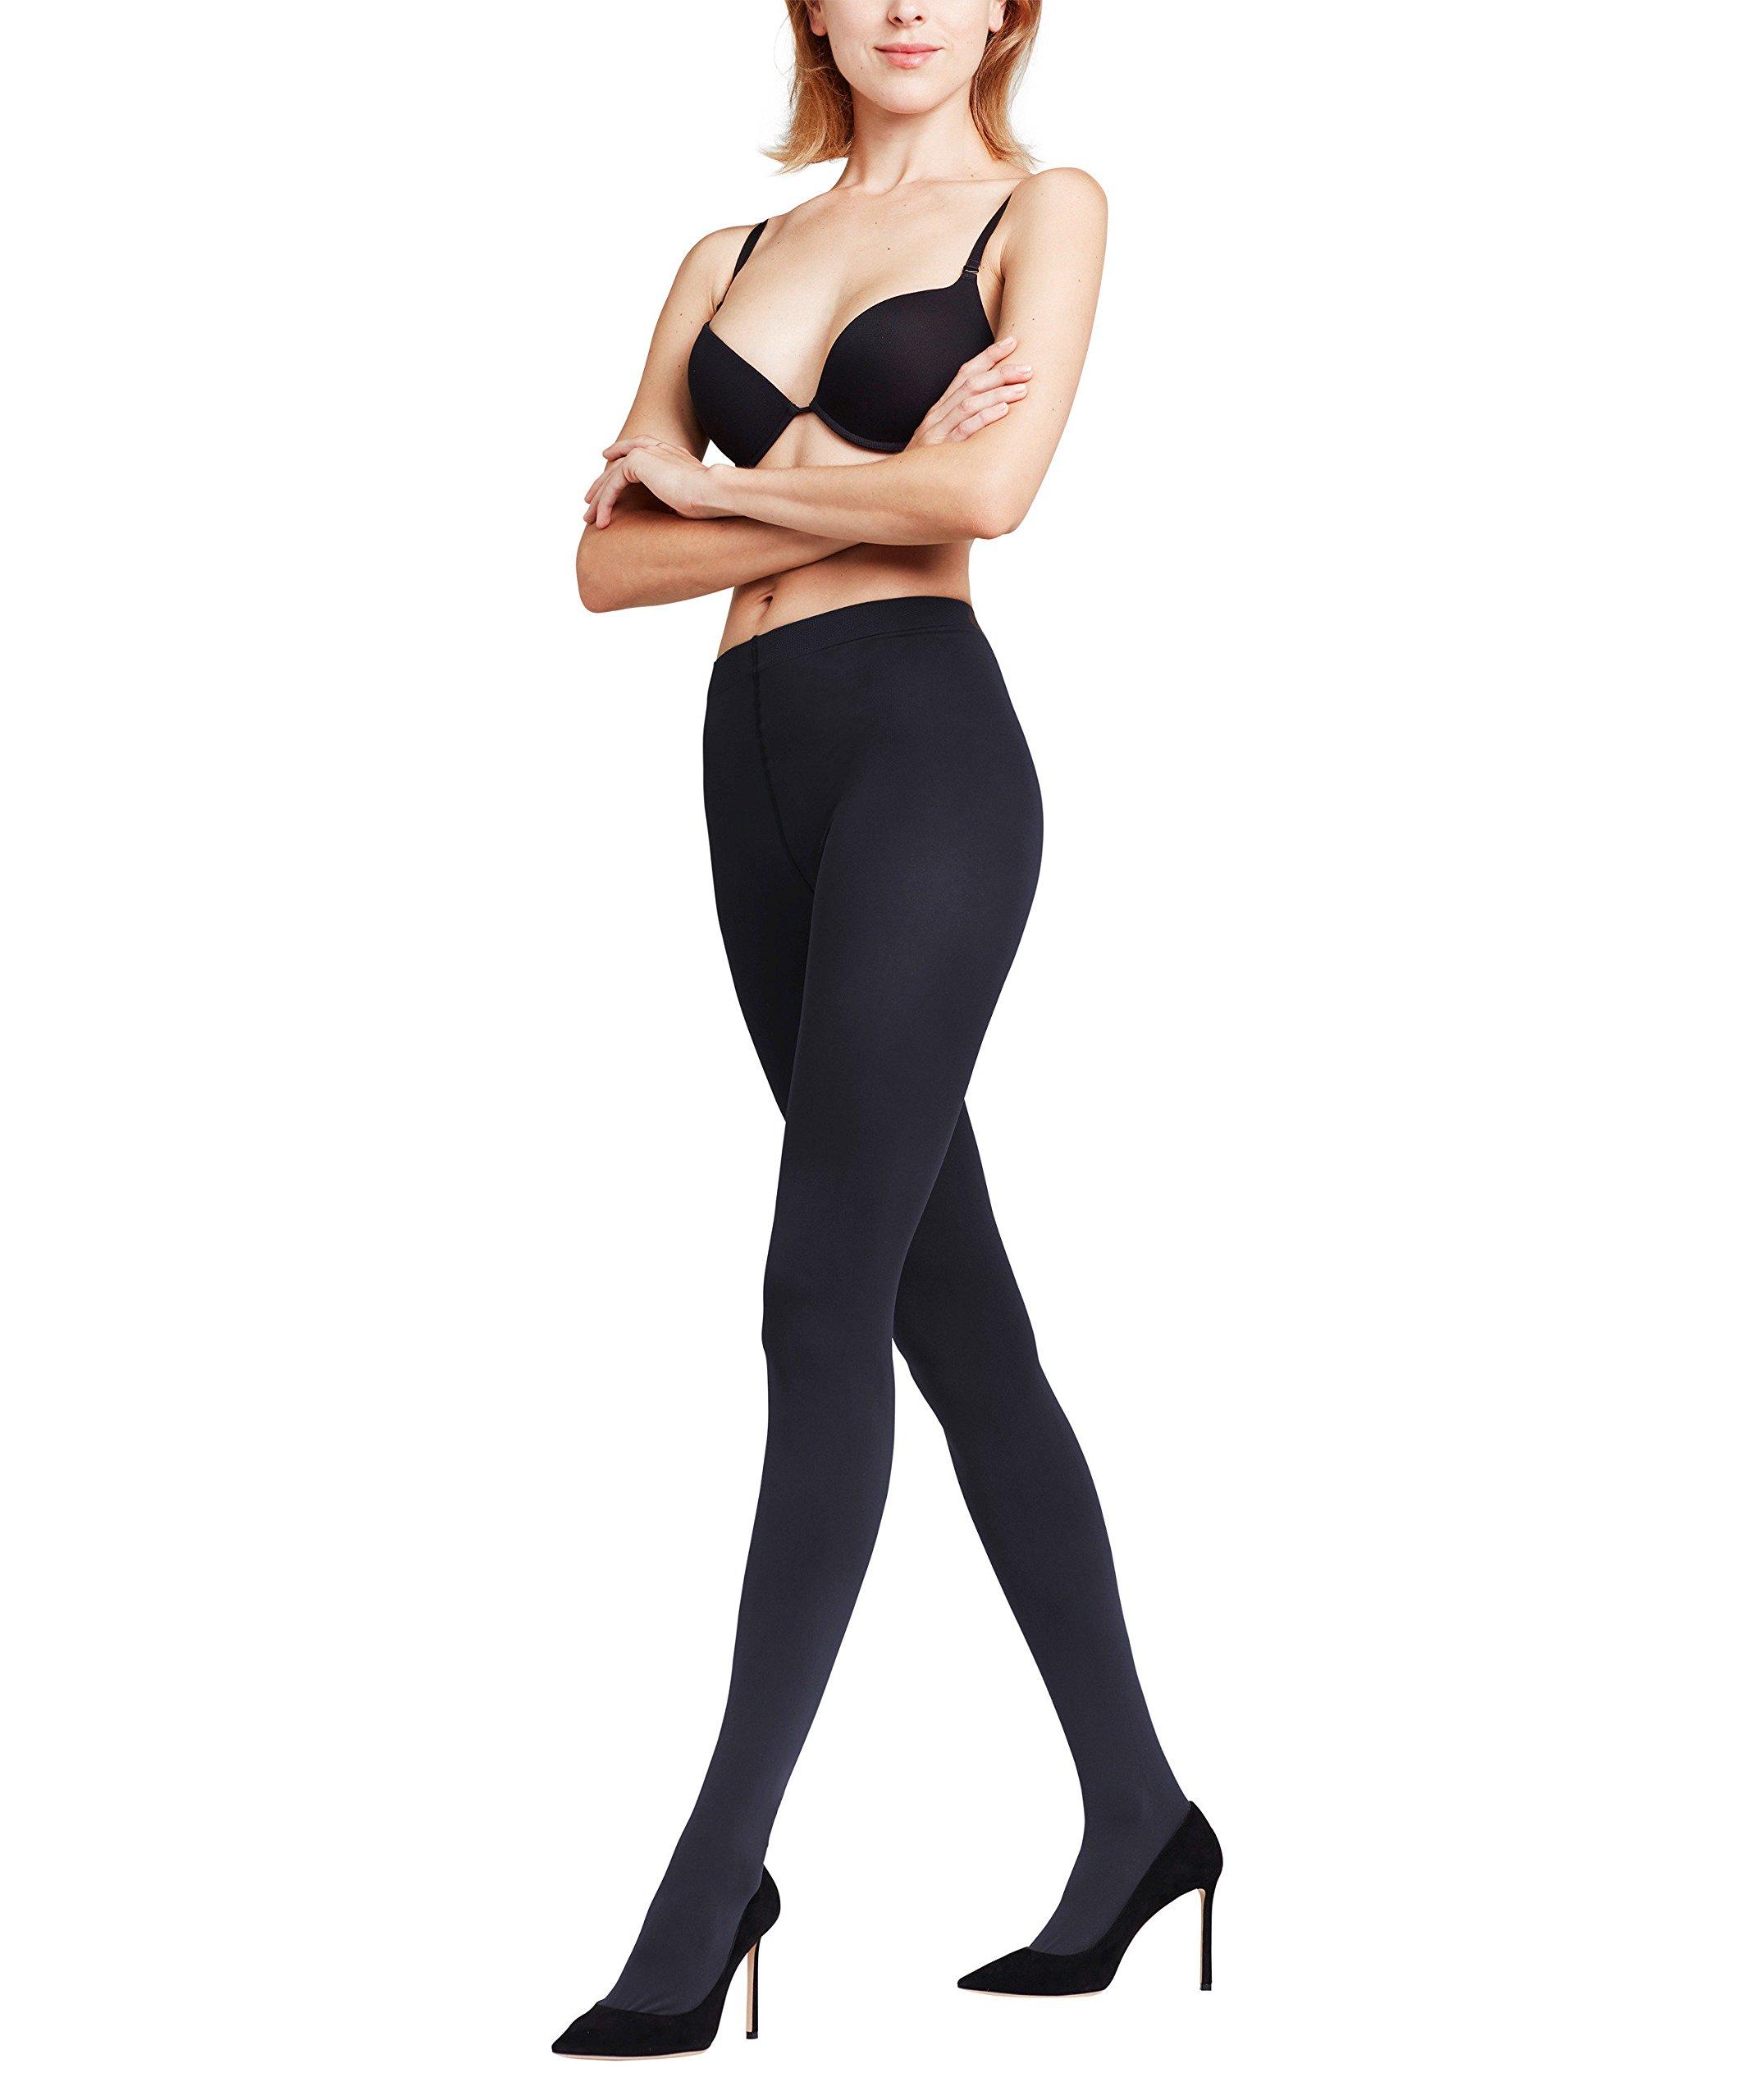 FALKE Women Pure Matt 100 DEN Tights - Opaque, Matt, Sizes S to XL, 1 Pair - Warm, ideal for wintery business or casual looks